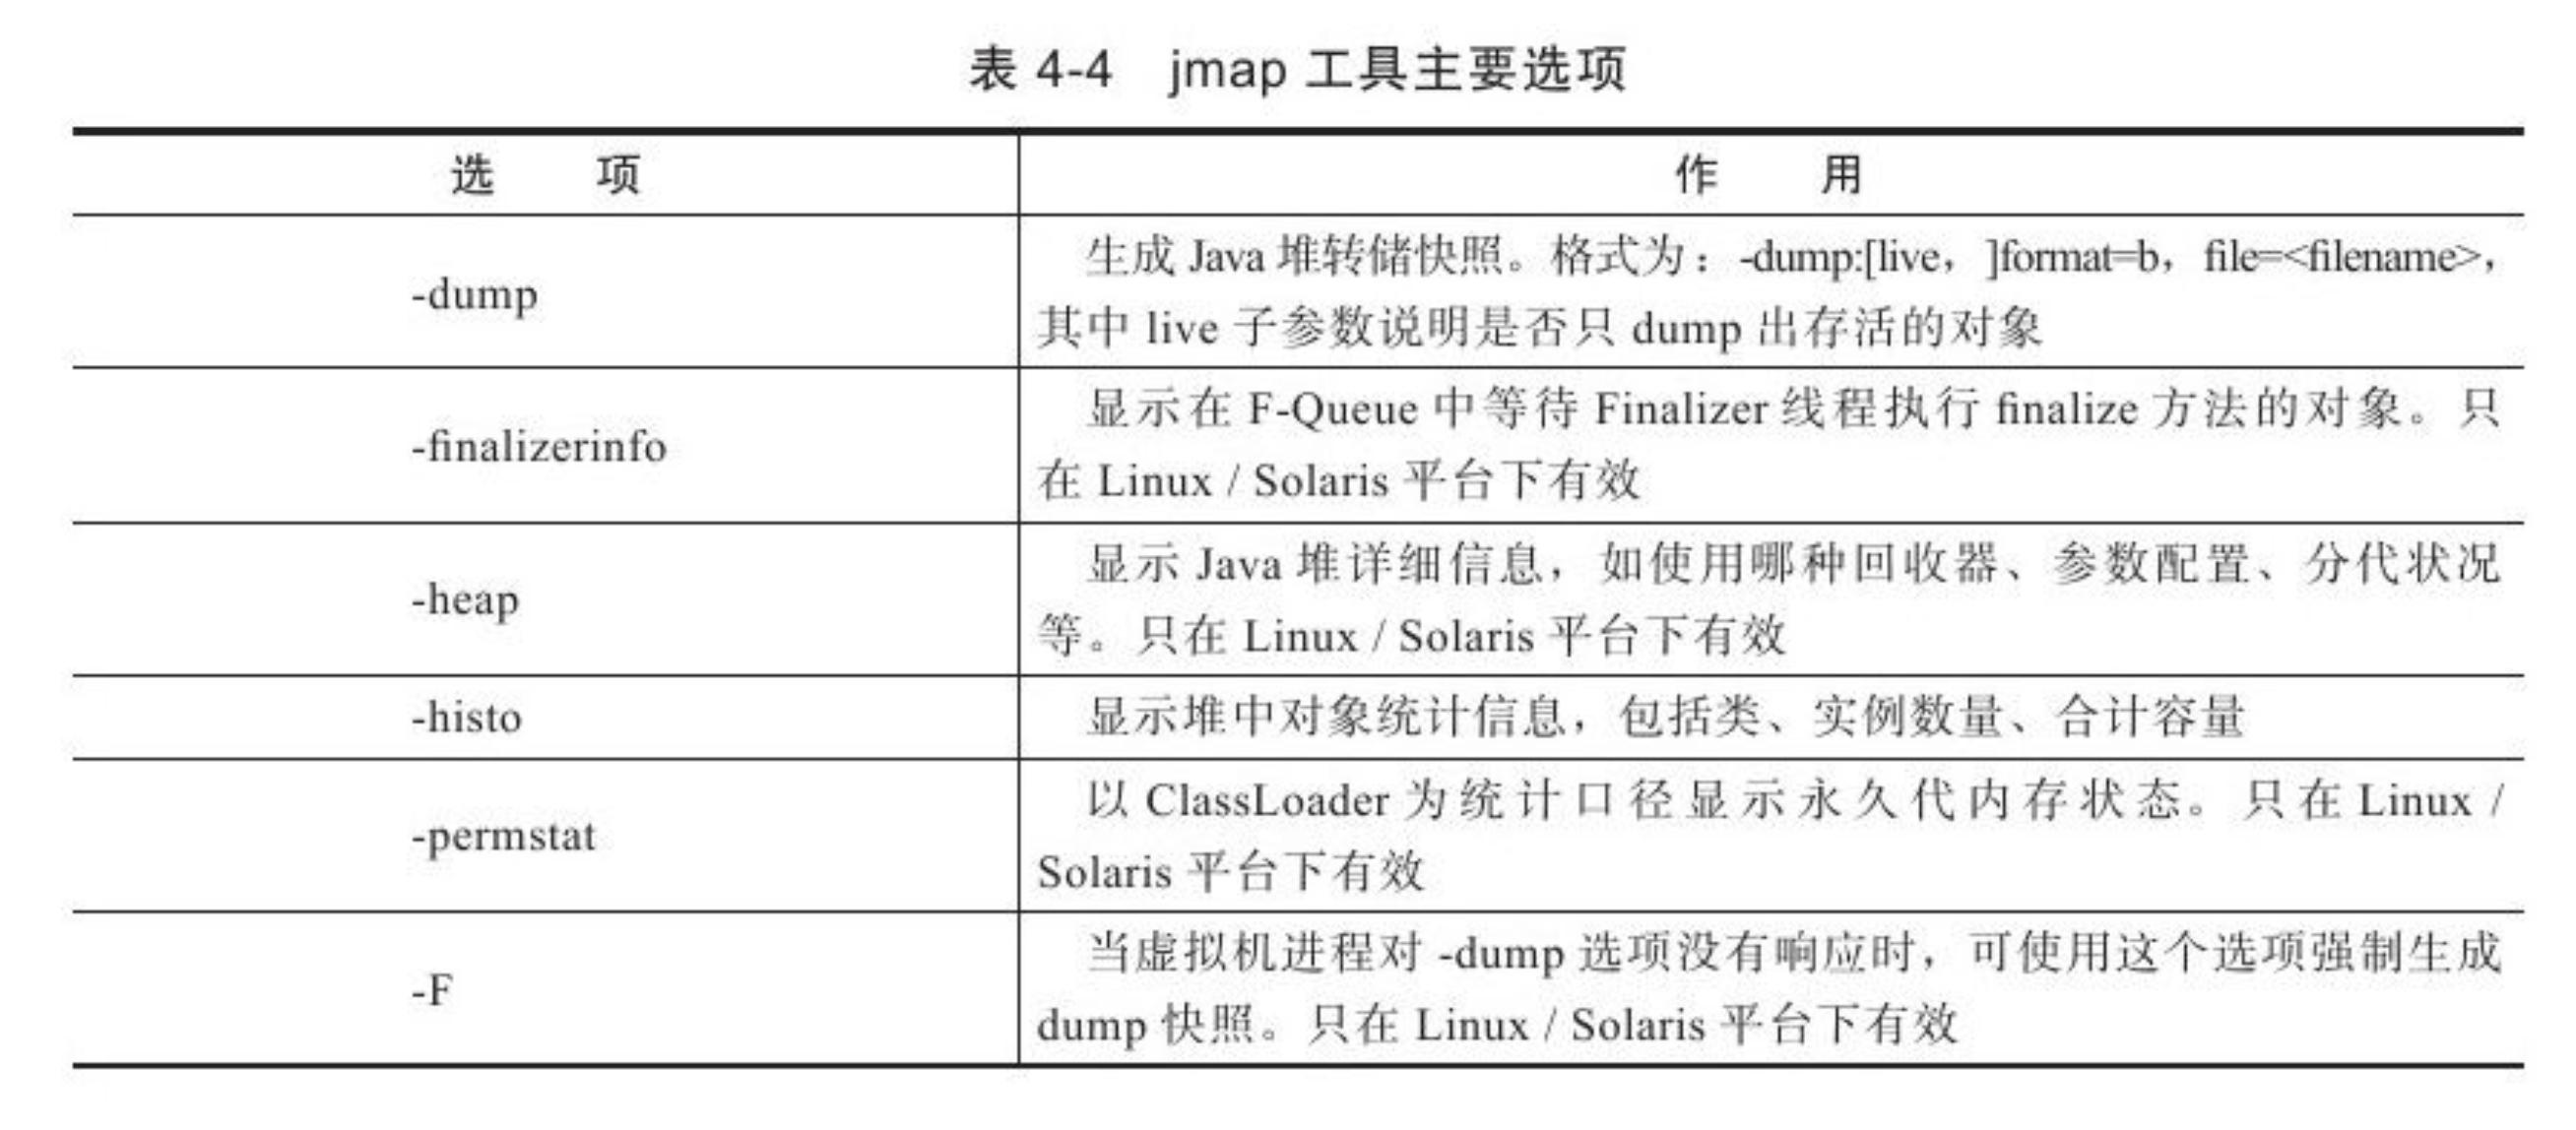 jmap工具主要选项